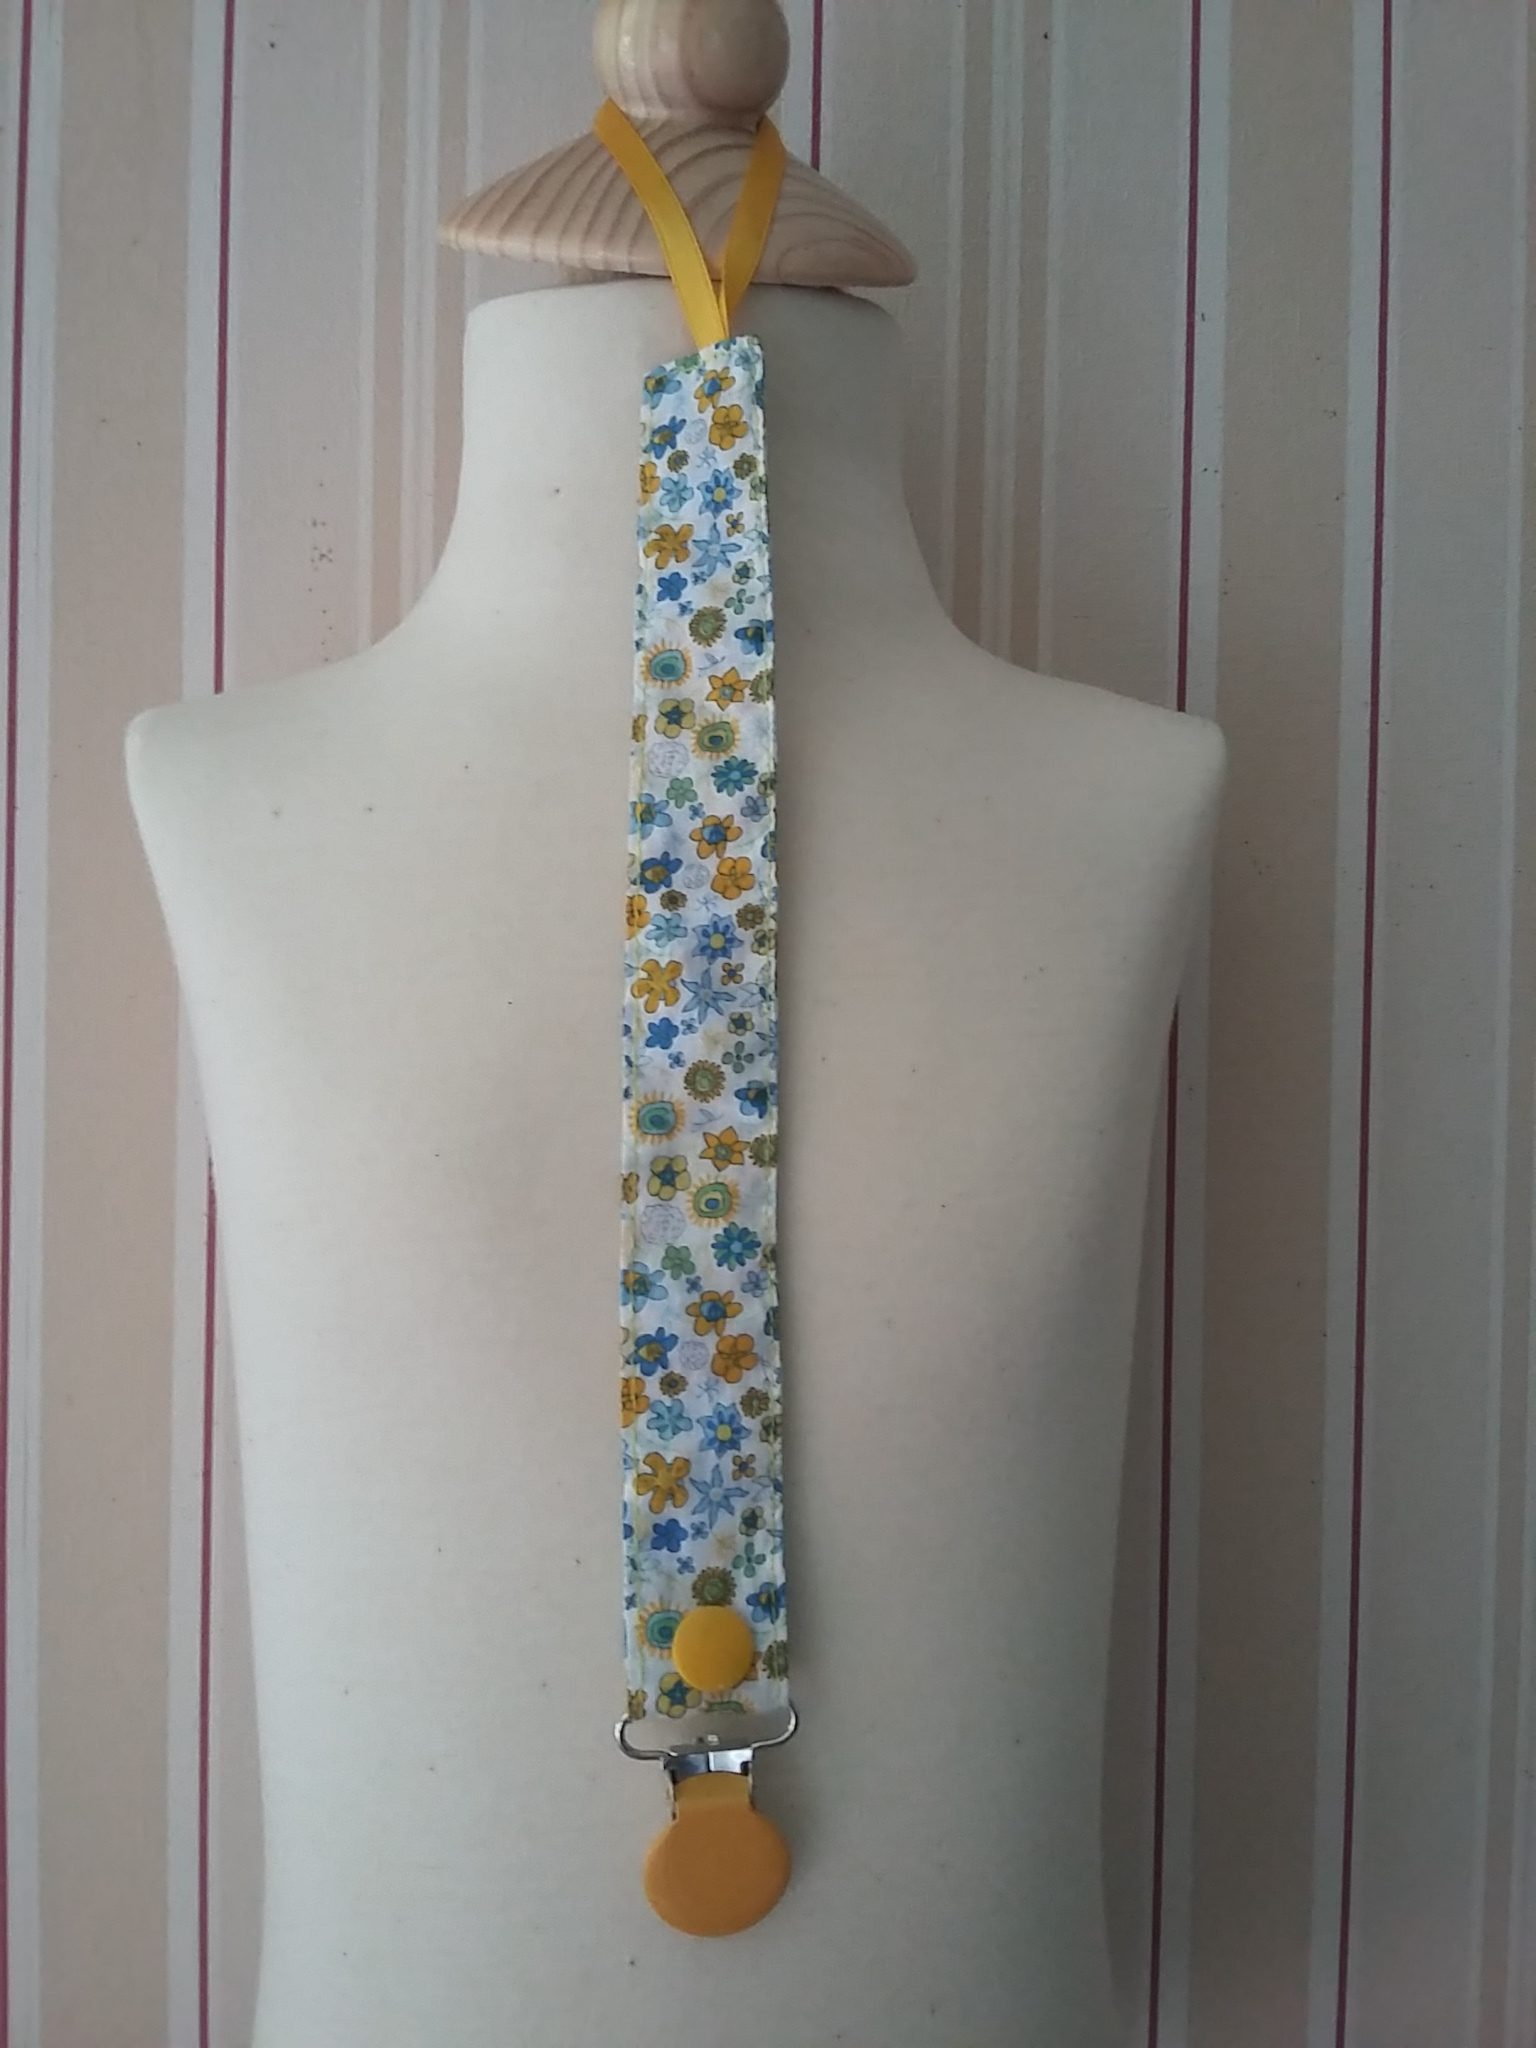 Attache-tétine Liberty Ibstonian bleu et jaune : 9 €